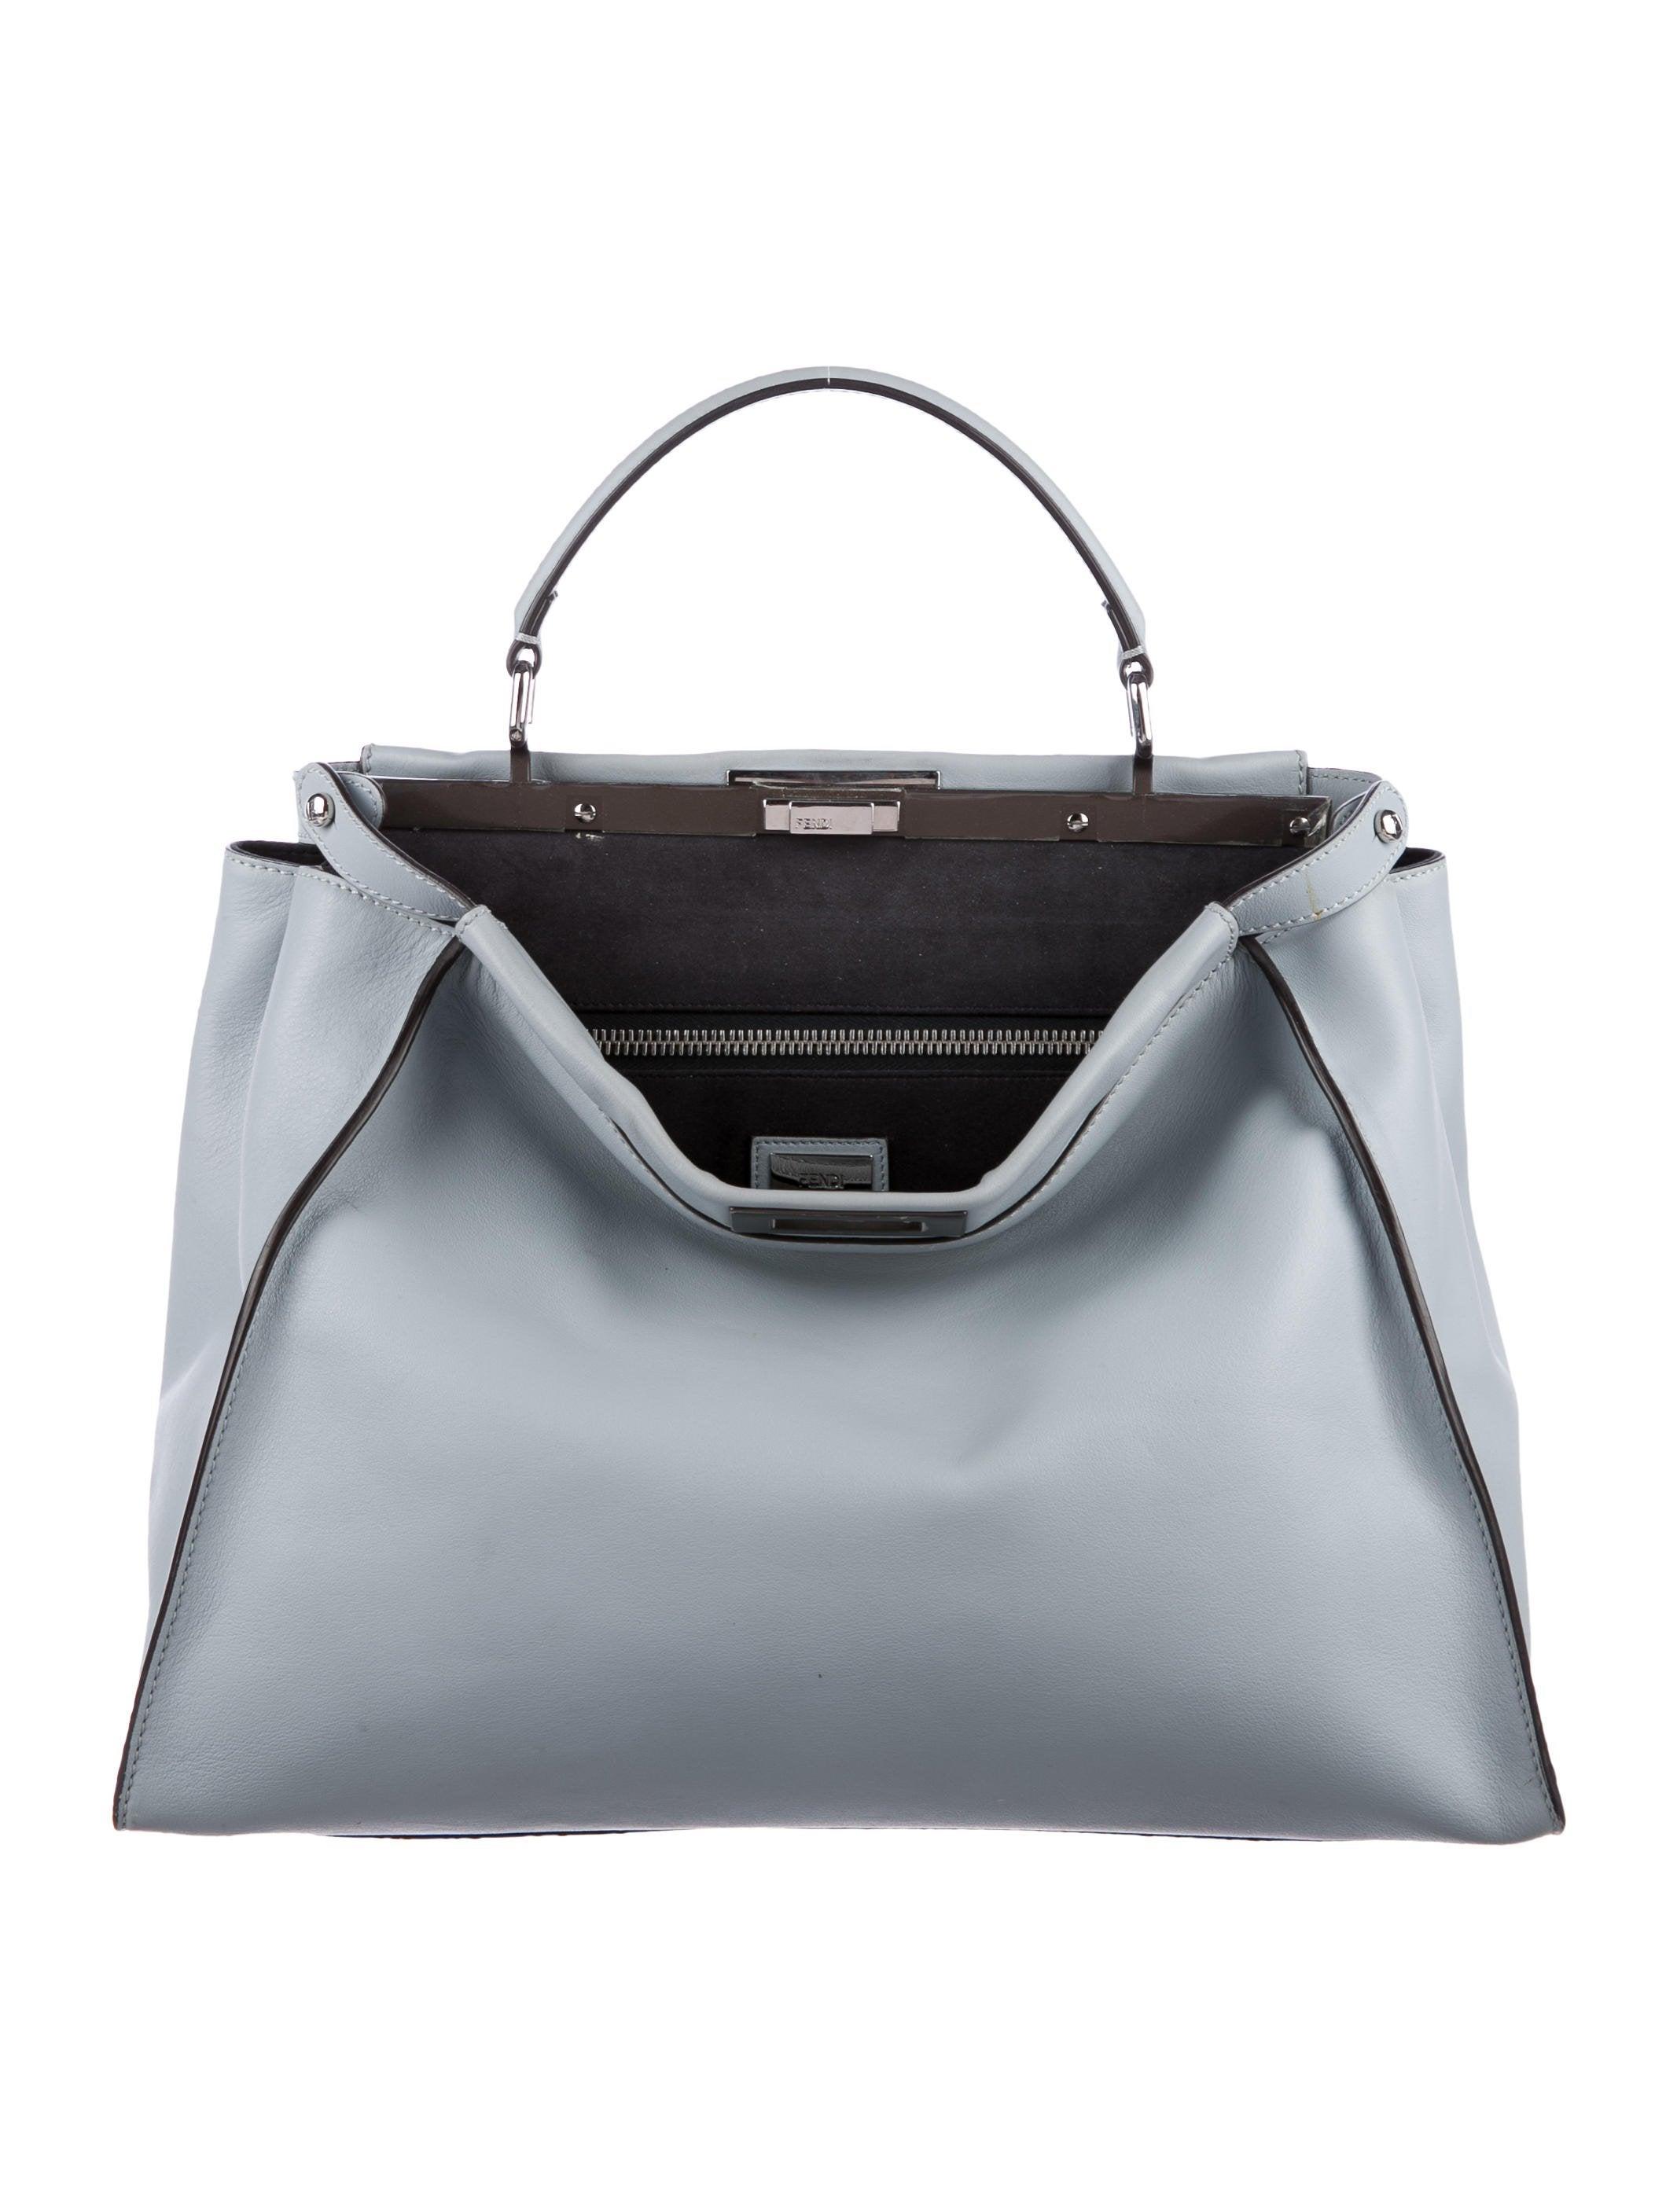 75091dd363 Fendi Large Peekaboo Bag - Handbags - FEN65773